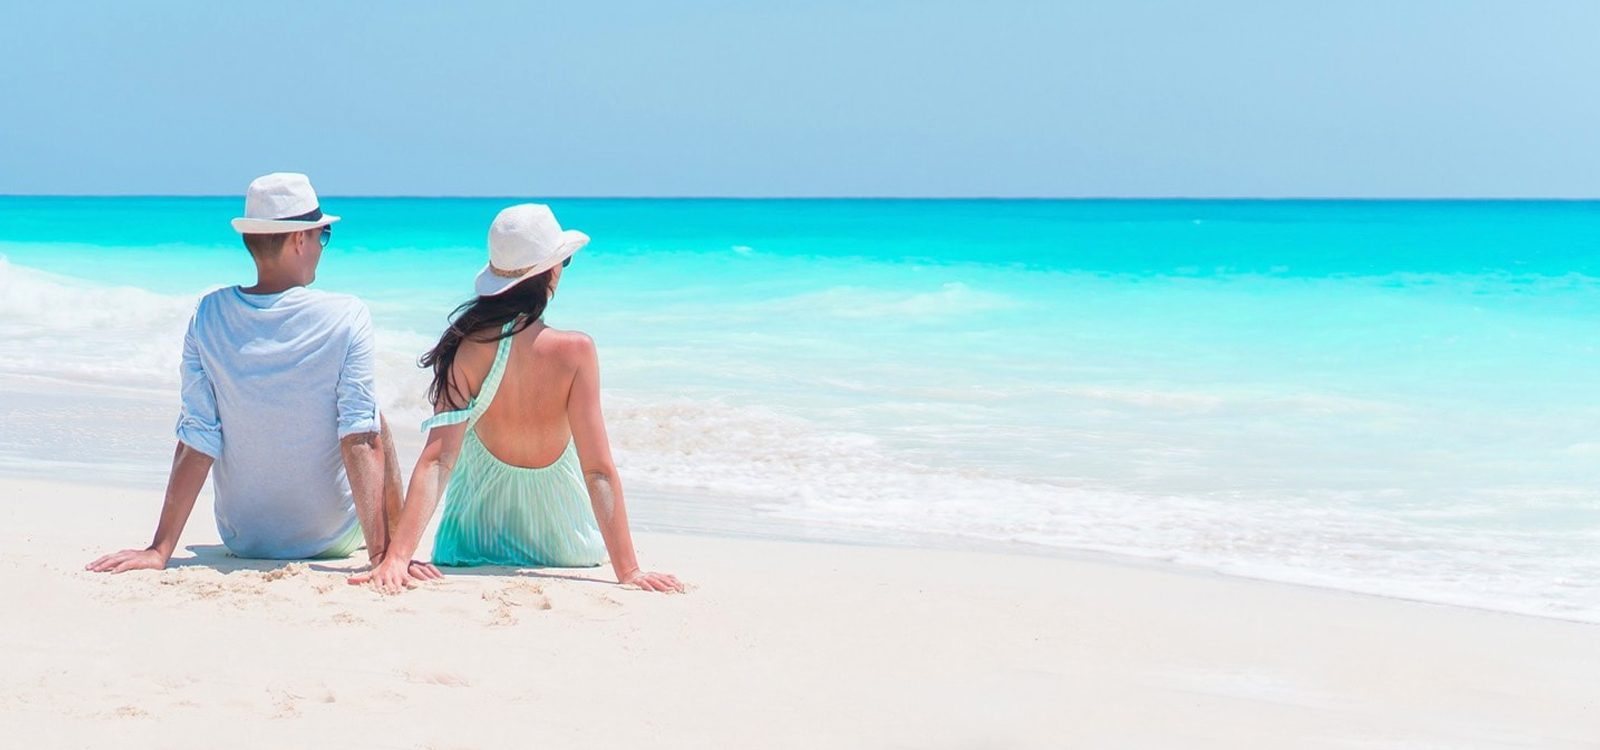 ofertas de viajes a Cabo Verde desde Galicia